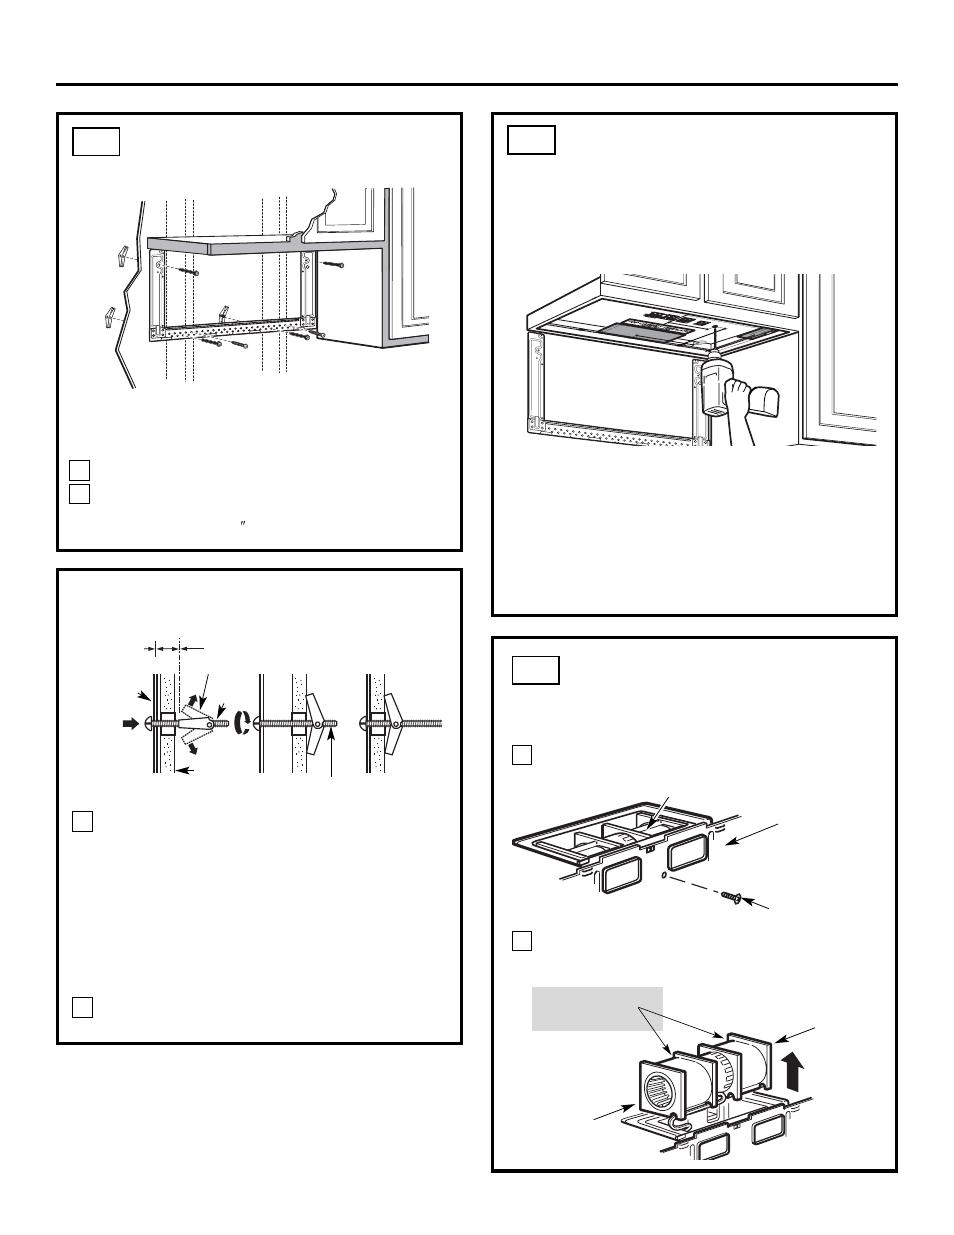 installation instructions frigidaire 316495063 user manual page rh manualsdir com frigidaire microwave fpbm189kf installation manual frigidaire gallery microwave installation instructions